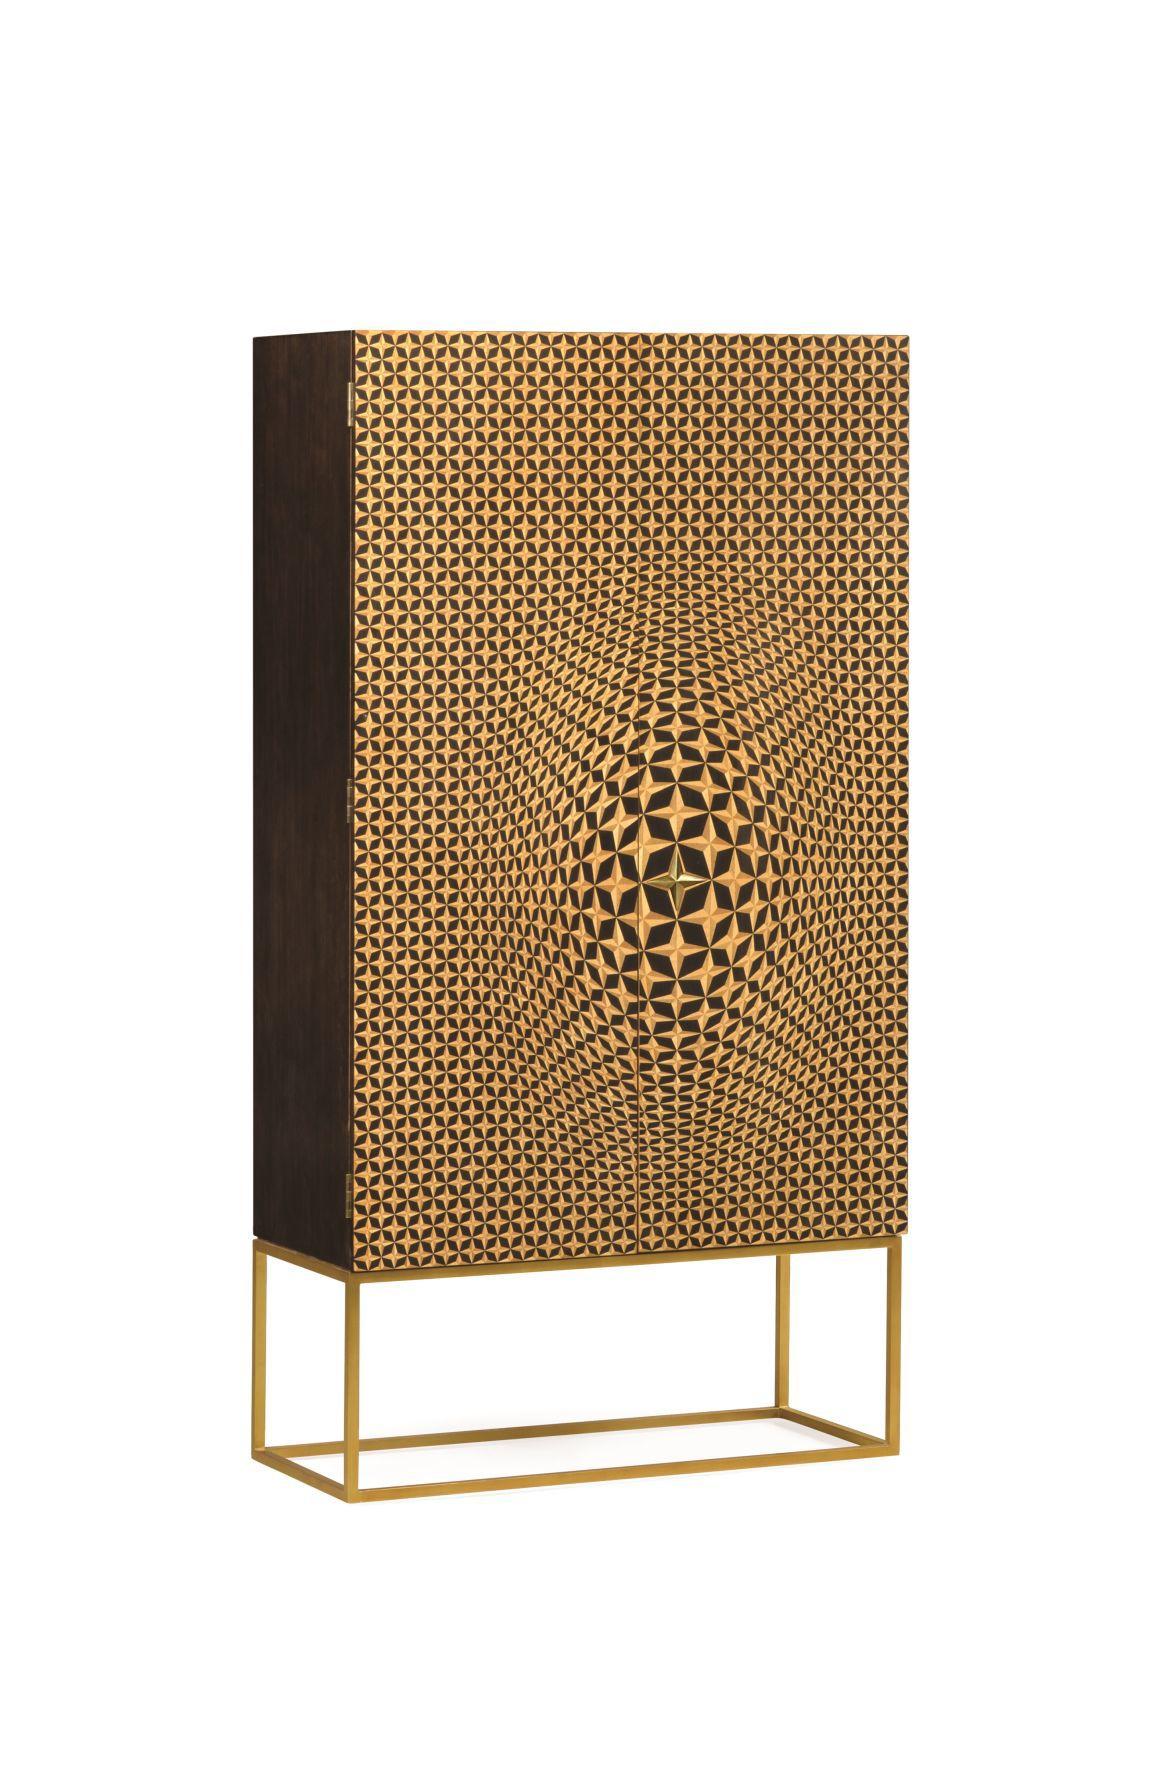 Jonathan Charles- Four-Point Star 3D Geometric Cabinet (2).jpg